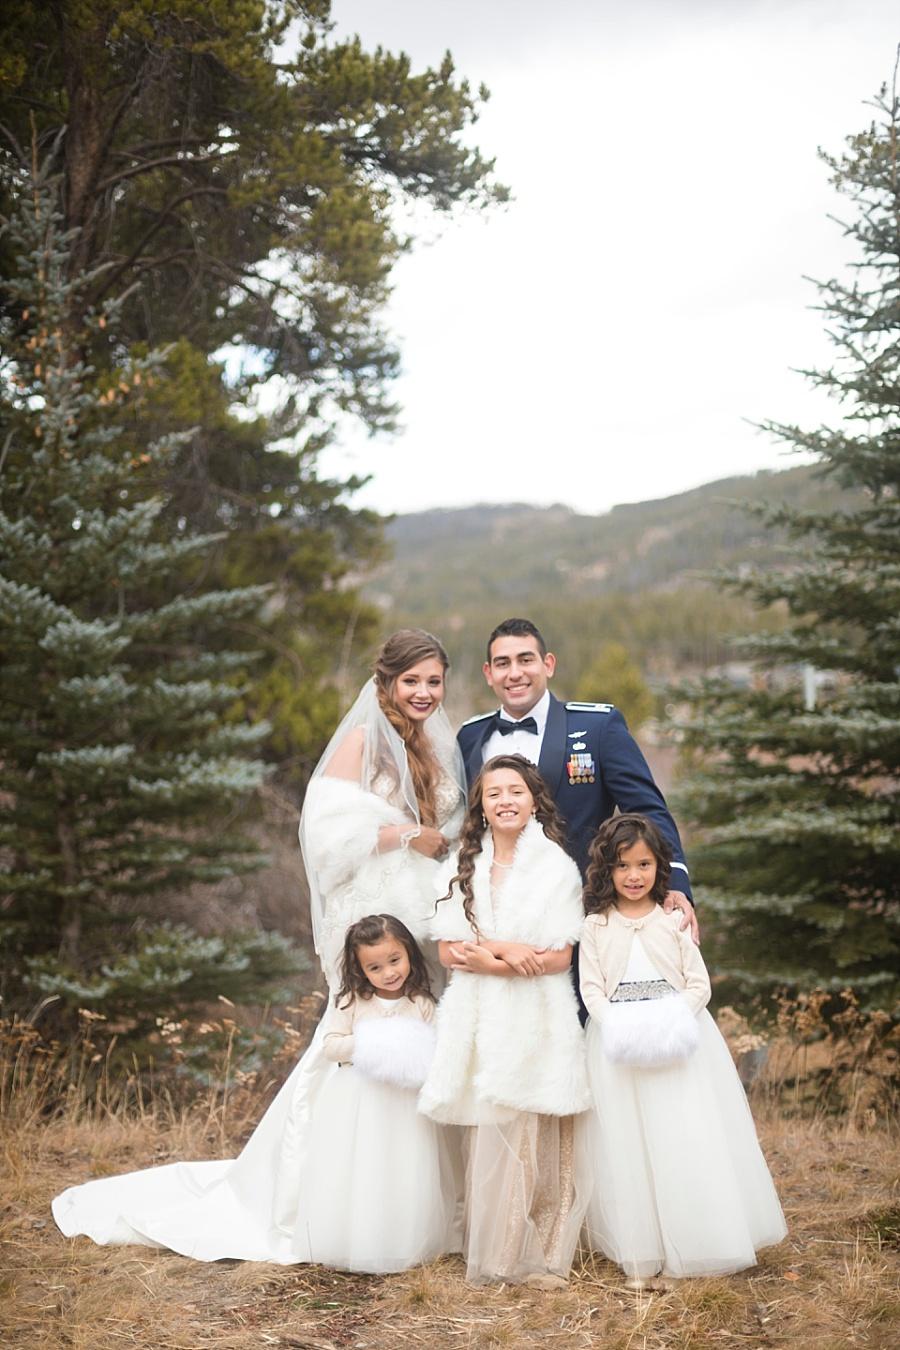 Stacy Anderson Photography Breckenridge Denver Boulder Vail Colorado Travel Lifestyle Elopement Vow renewal Family Wedding Photographer_0021.jpg